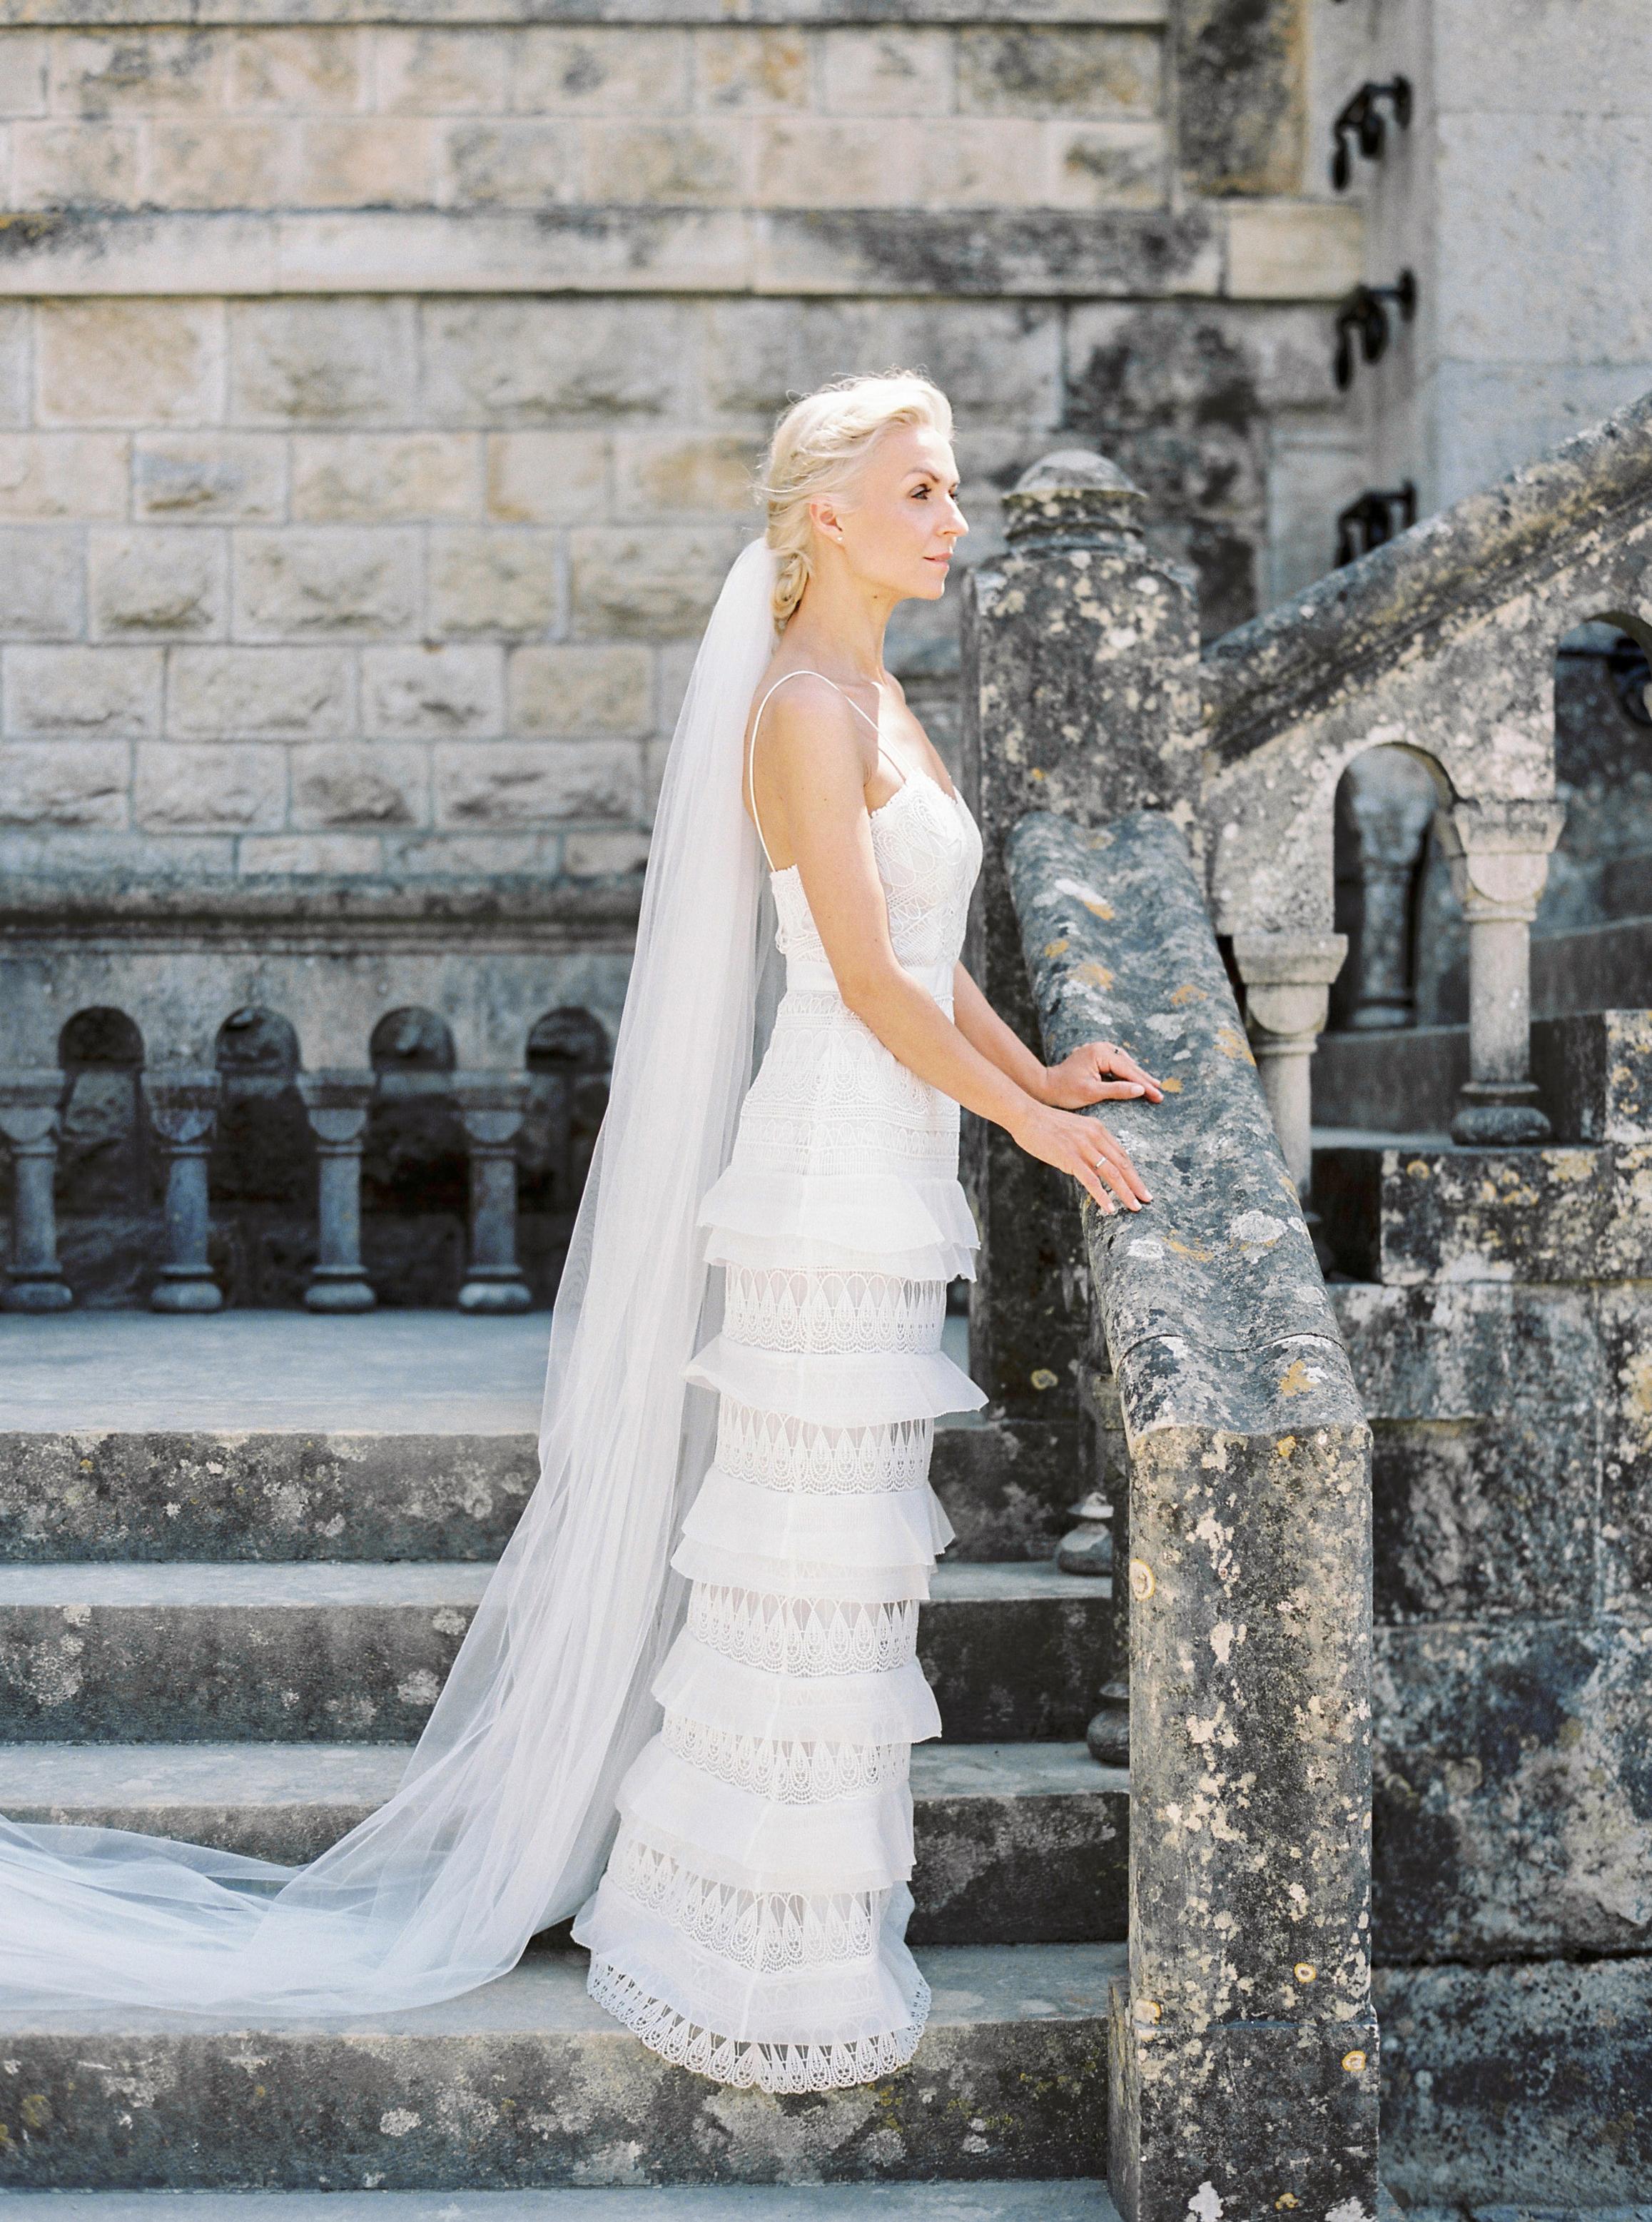 Nastia_Vesna_Photography_Wedding_Portugal_38.jpg